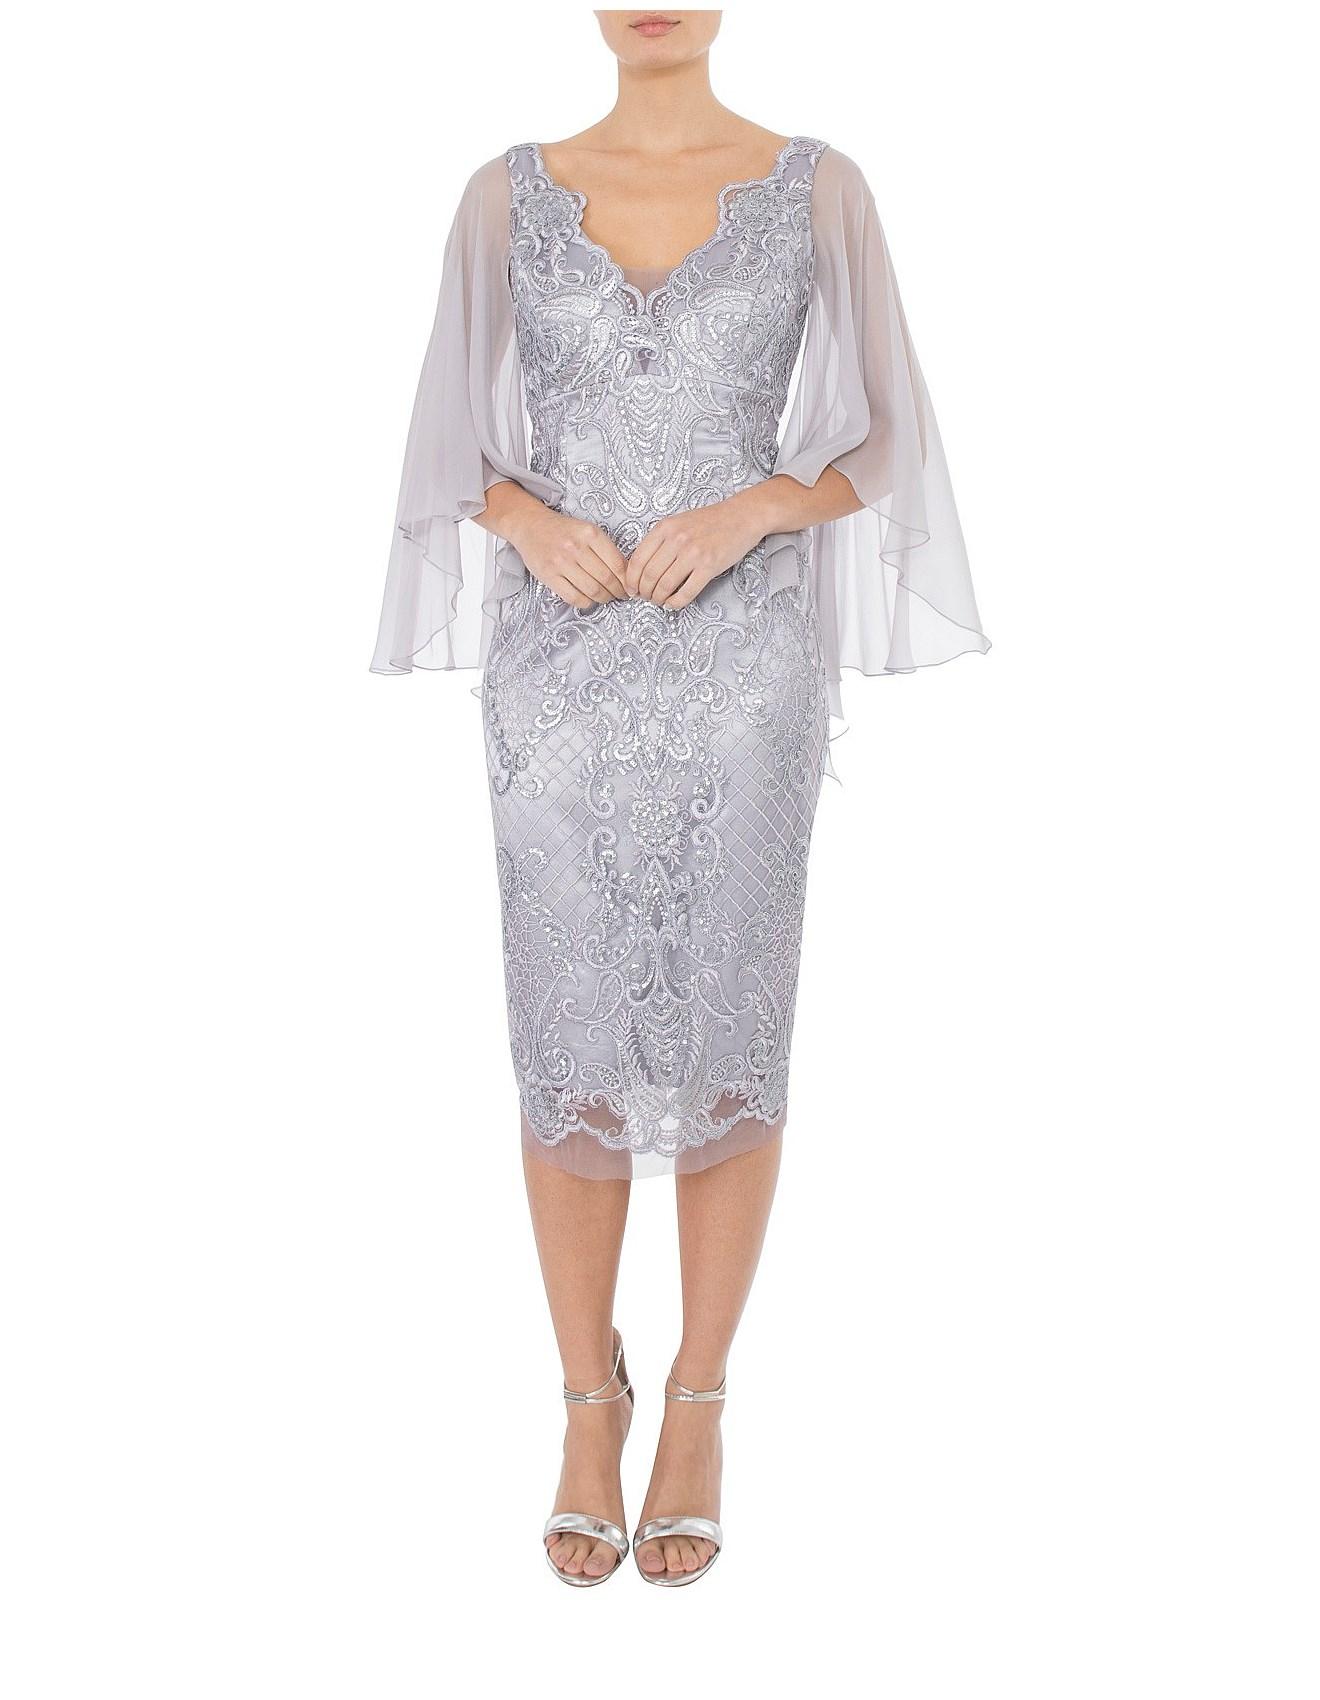 anthea crawford dresses,